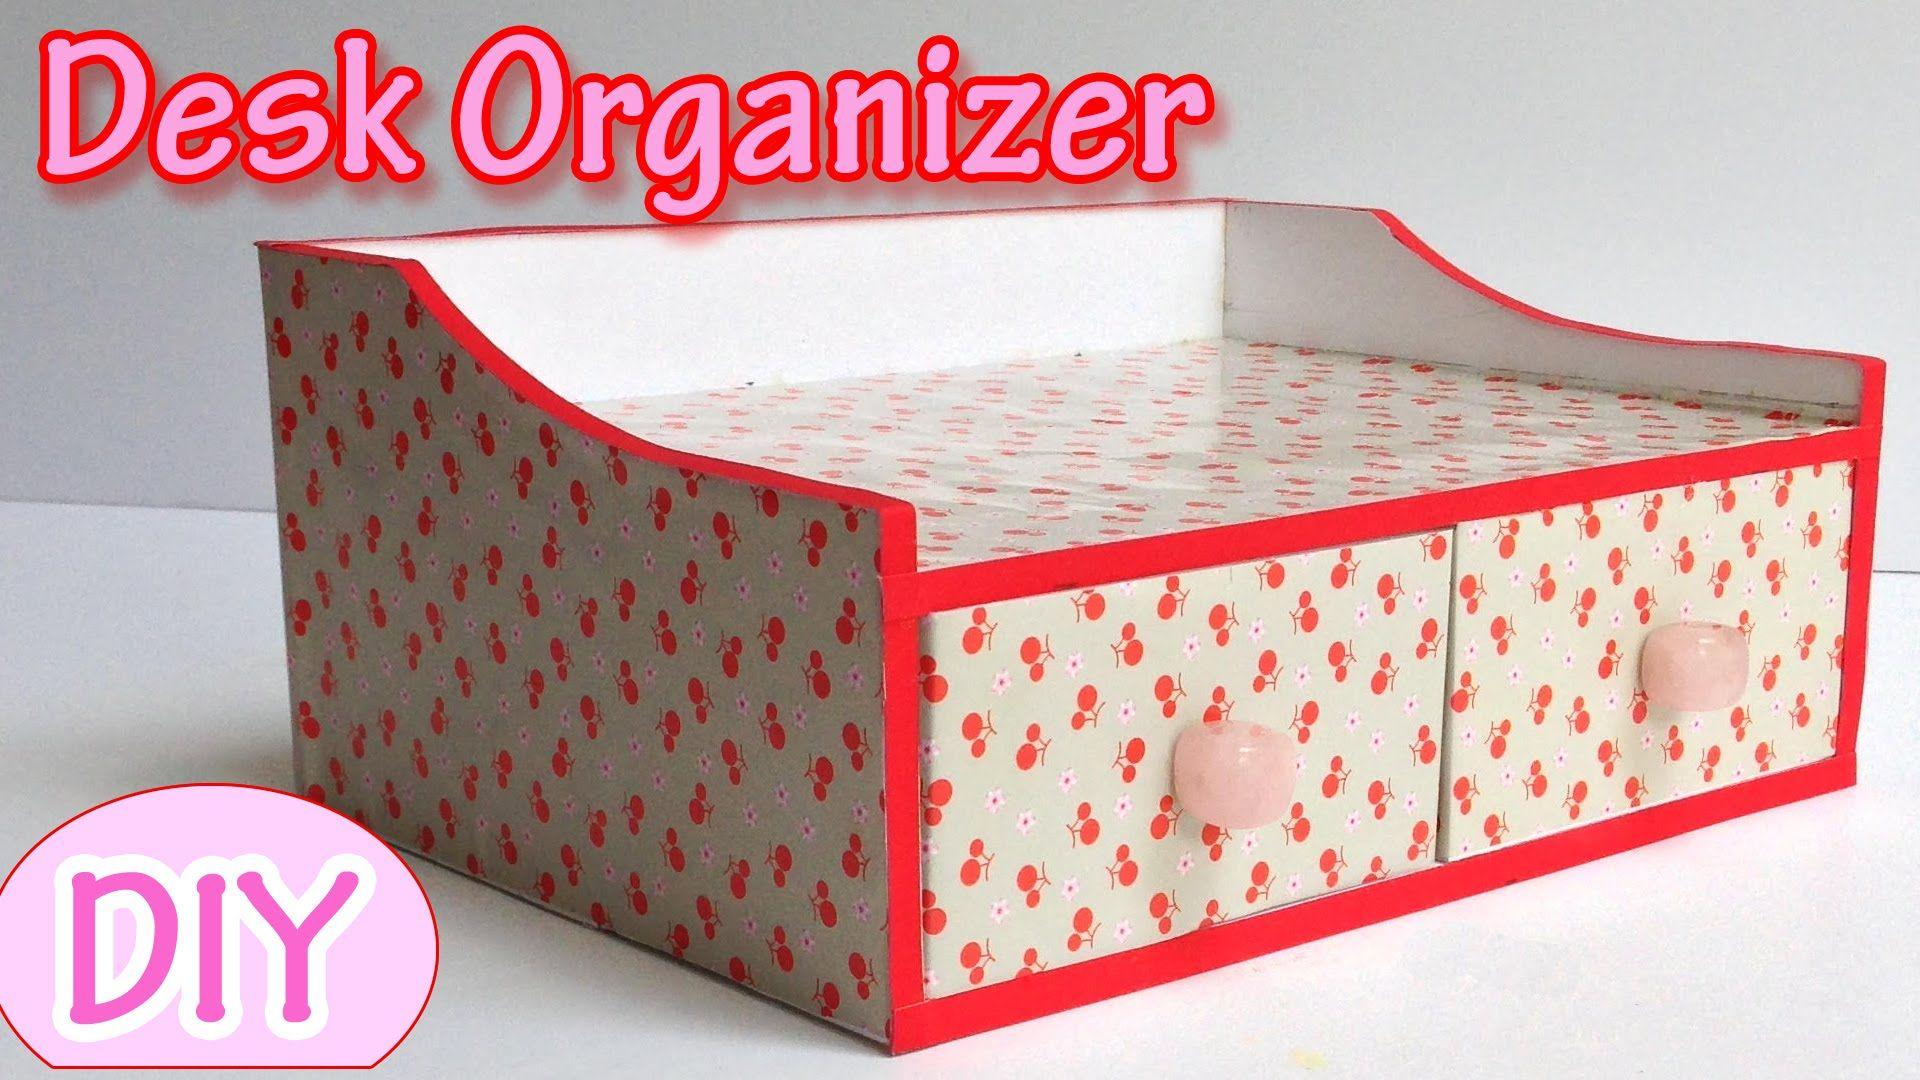 diy desk organizer tutorial